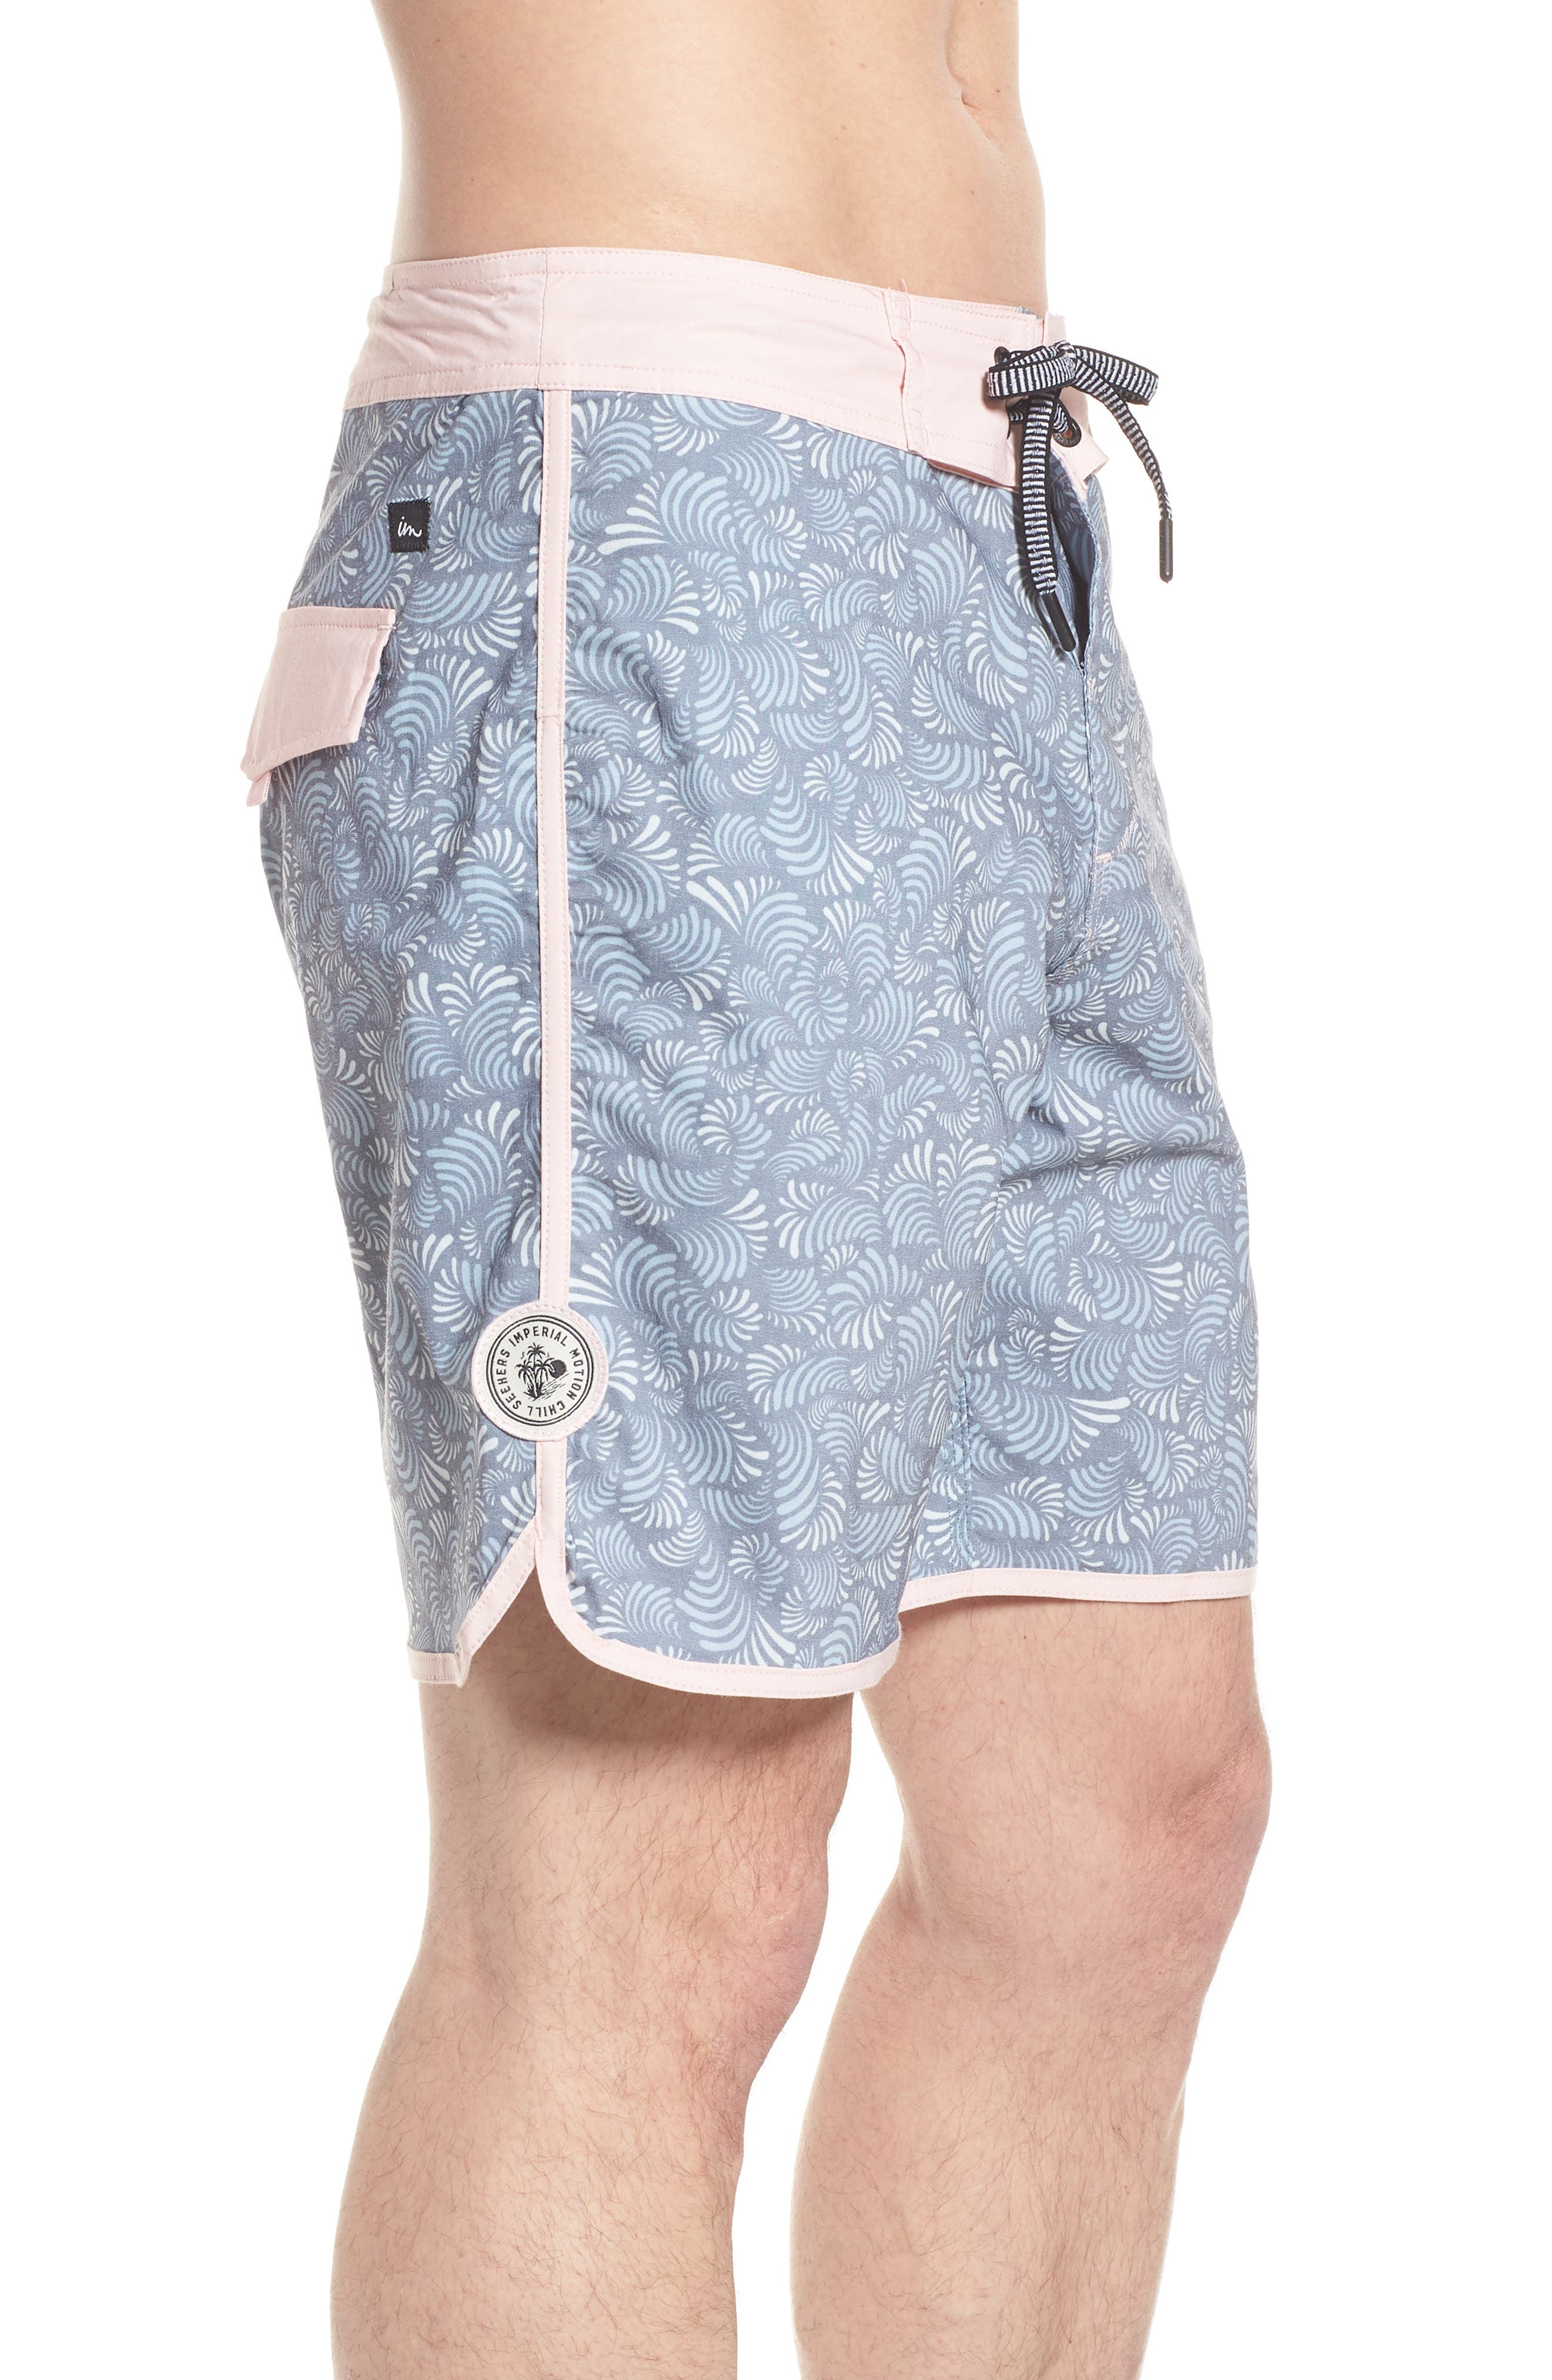 Seeker Board Shorts,                             Alternate thumbnail 3, color,                             Light Pink/ Blue